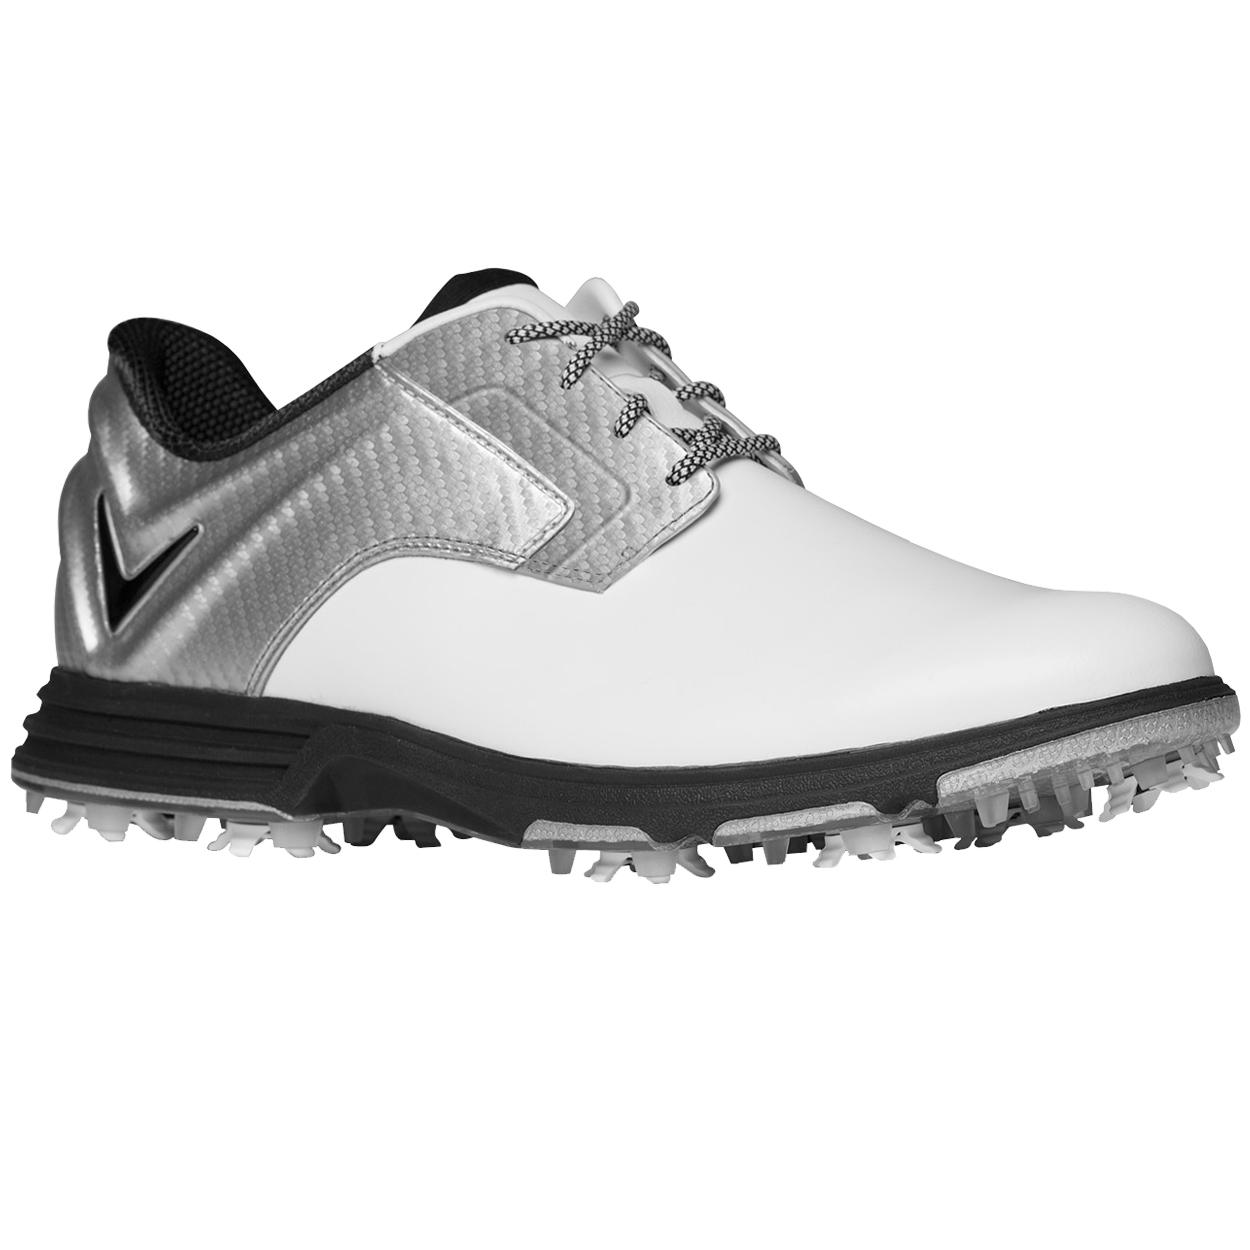 Callaway Primero Golf Shoe